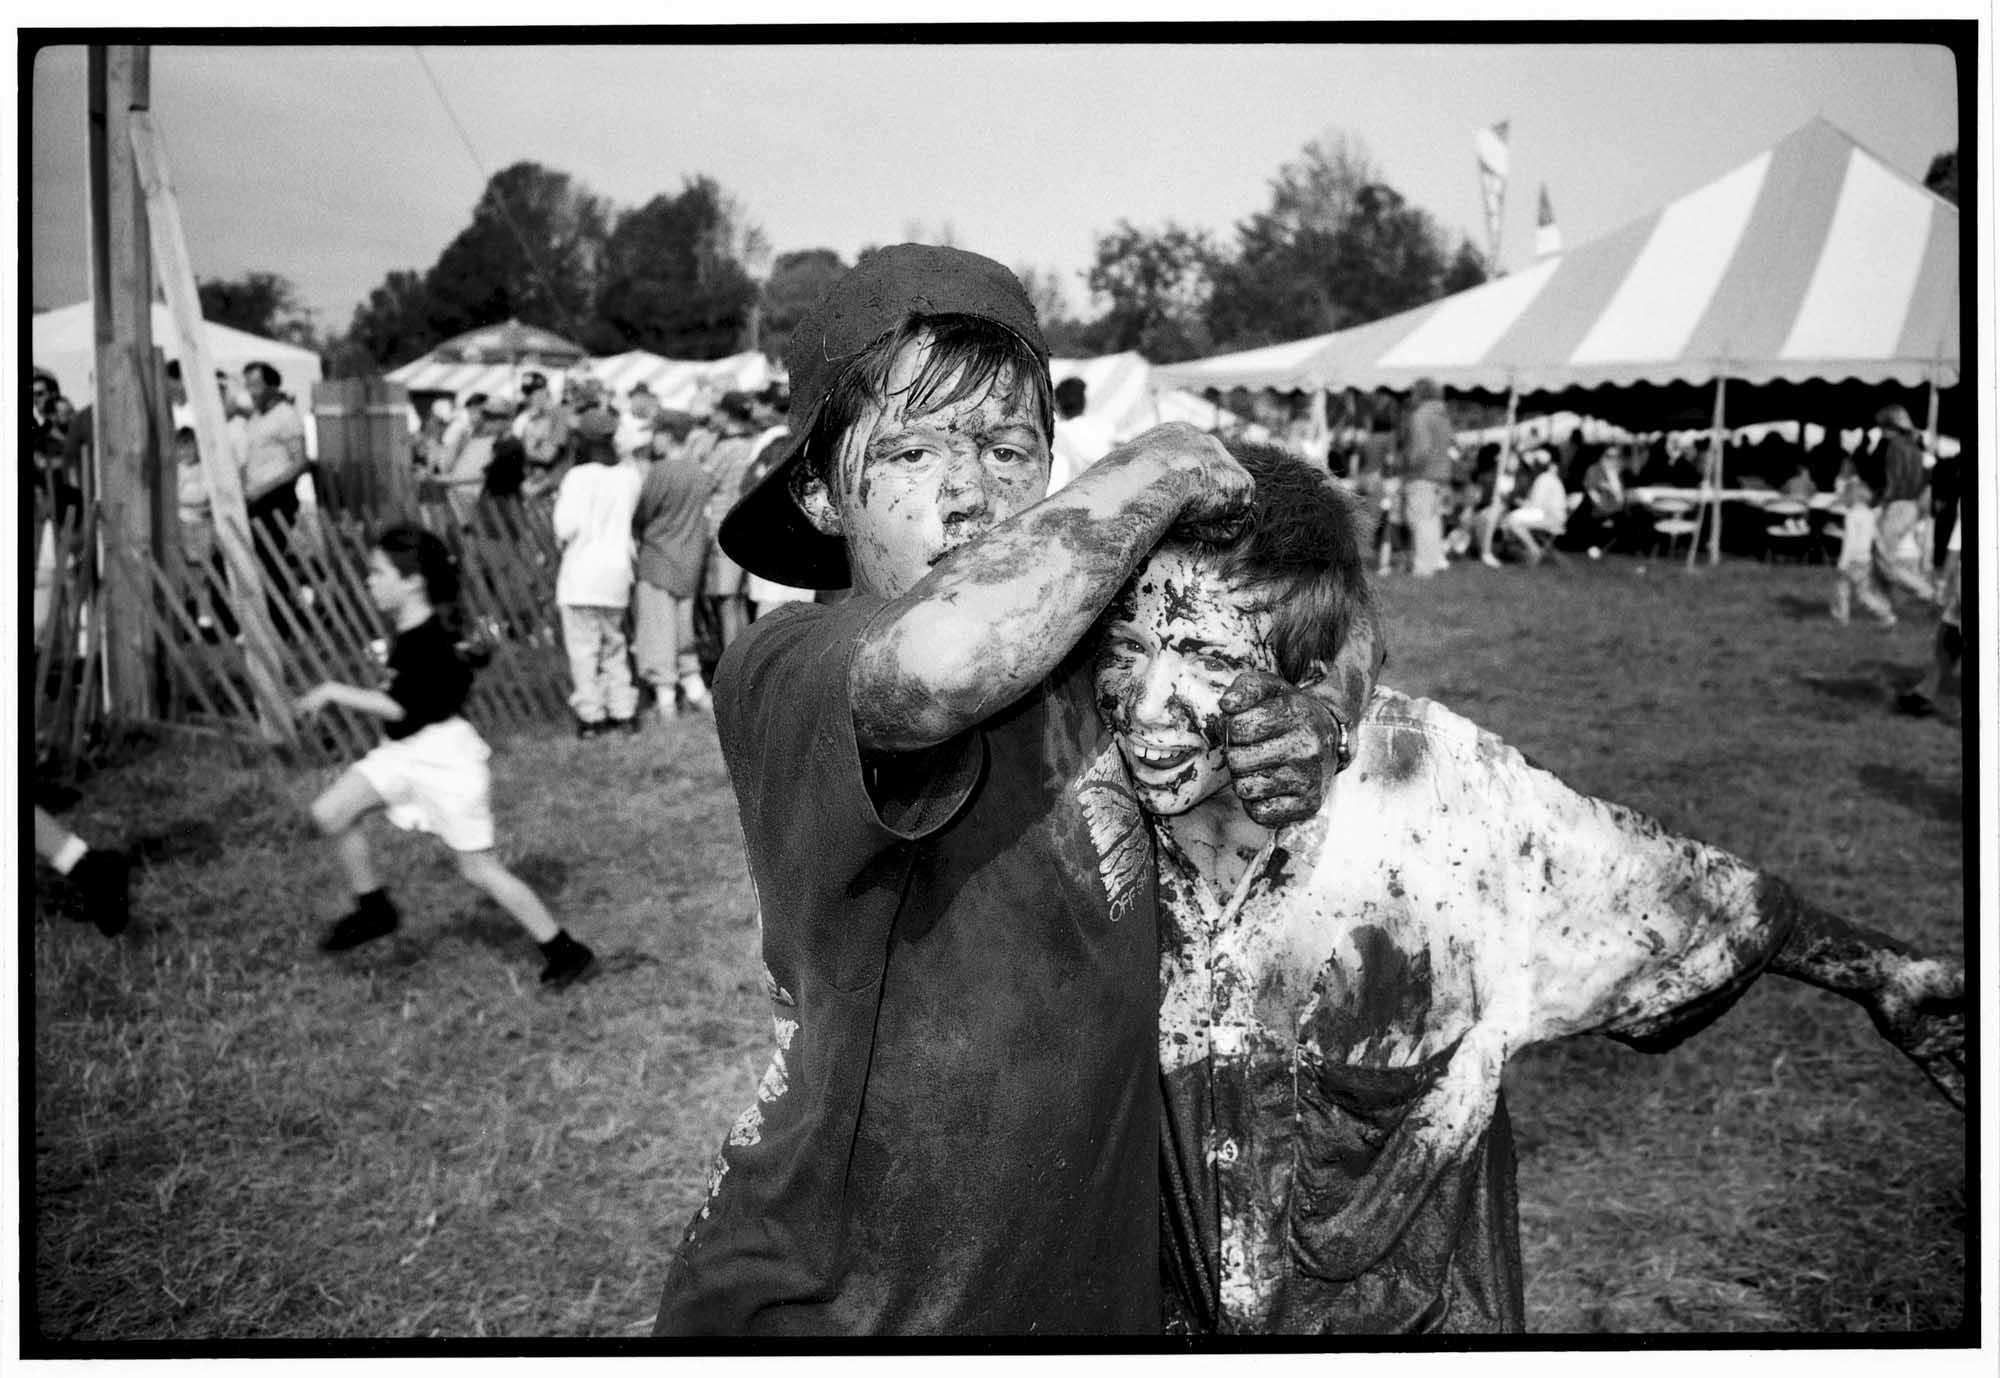 WilliamHeydt-Photographs-C3437-24.jpg